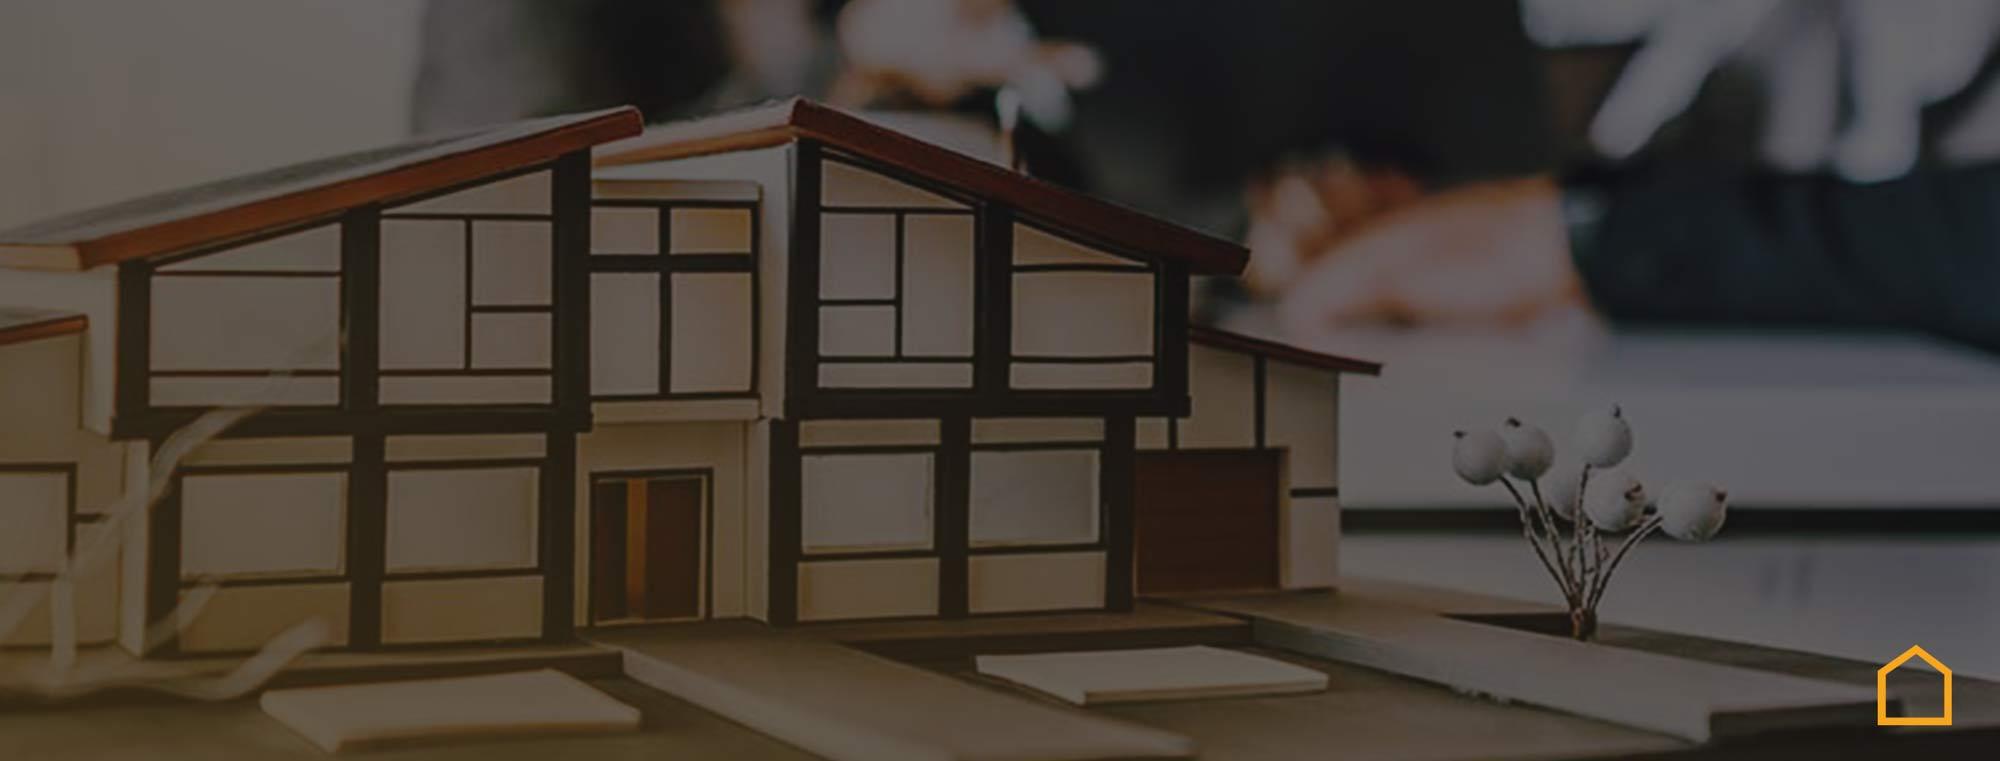 city immobilienmakler lexikon immobilie vermieten